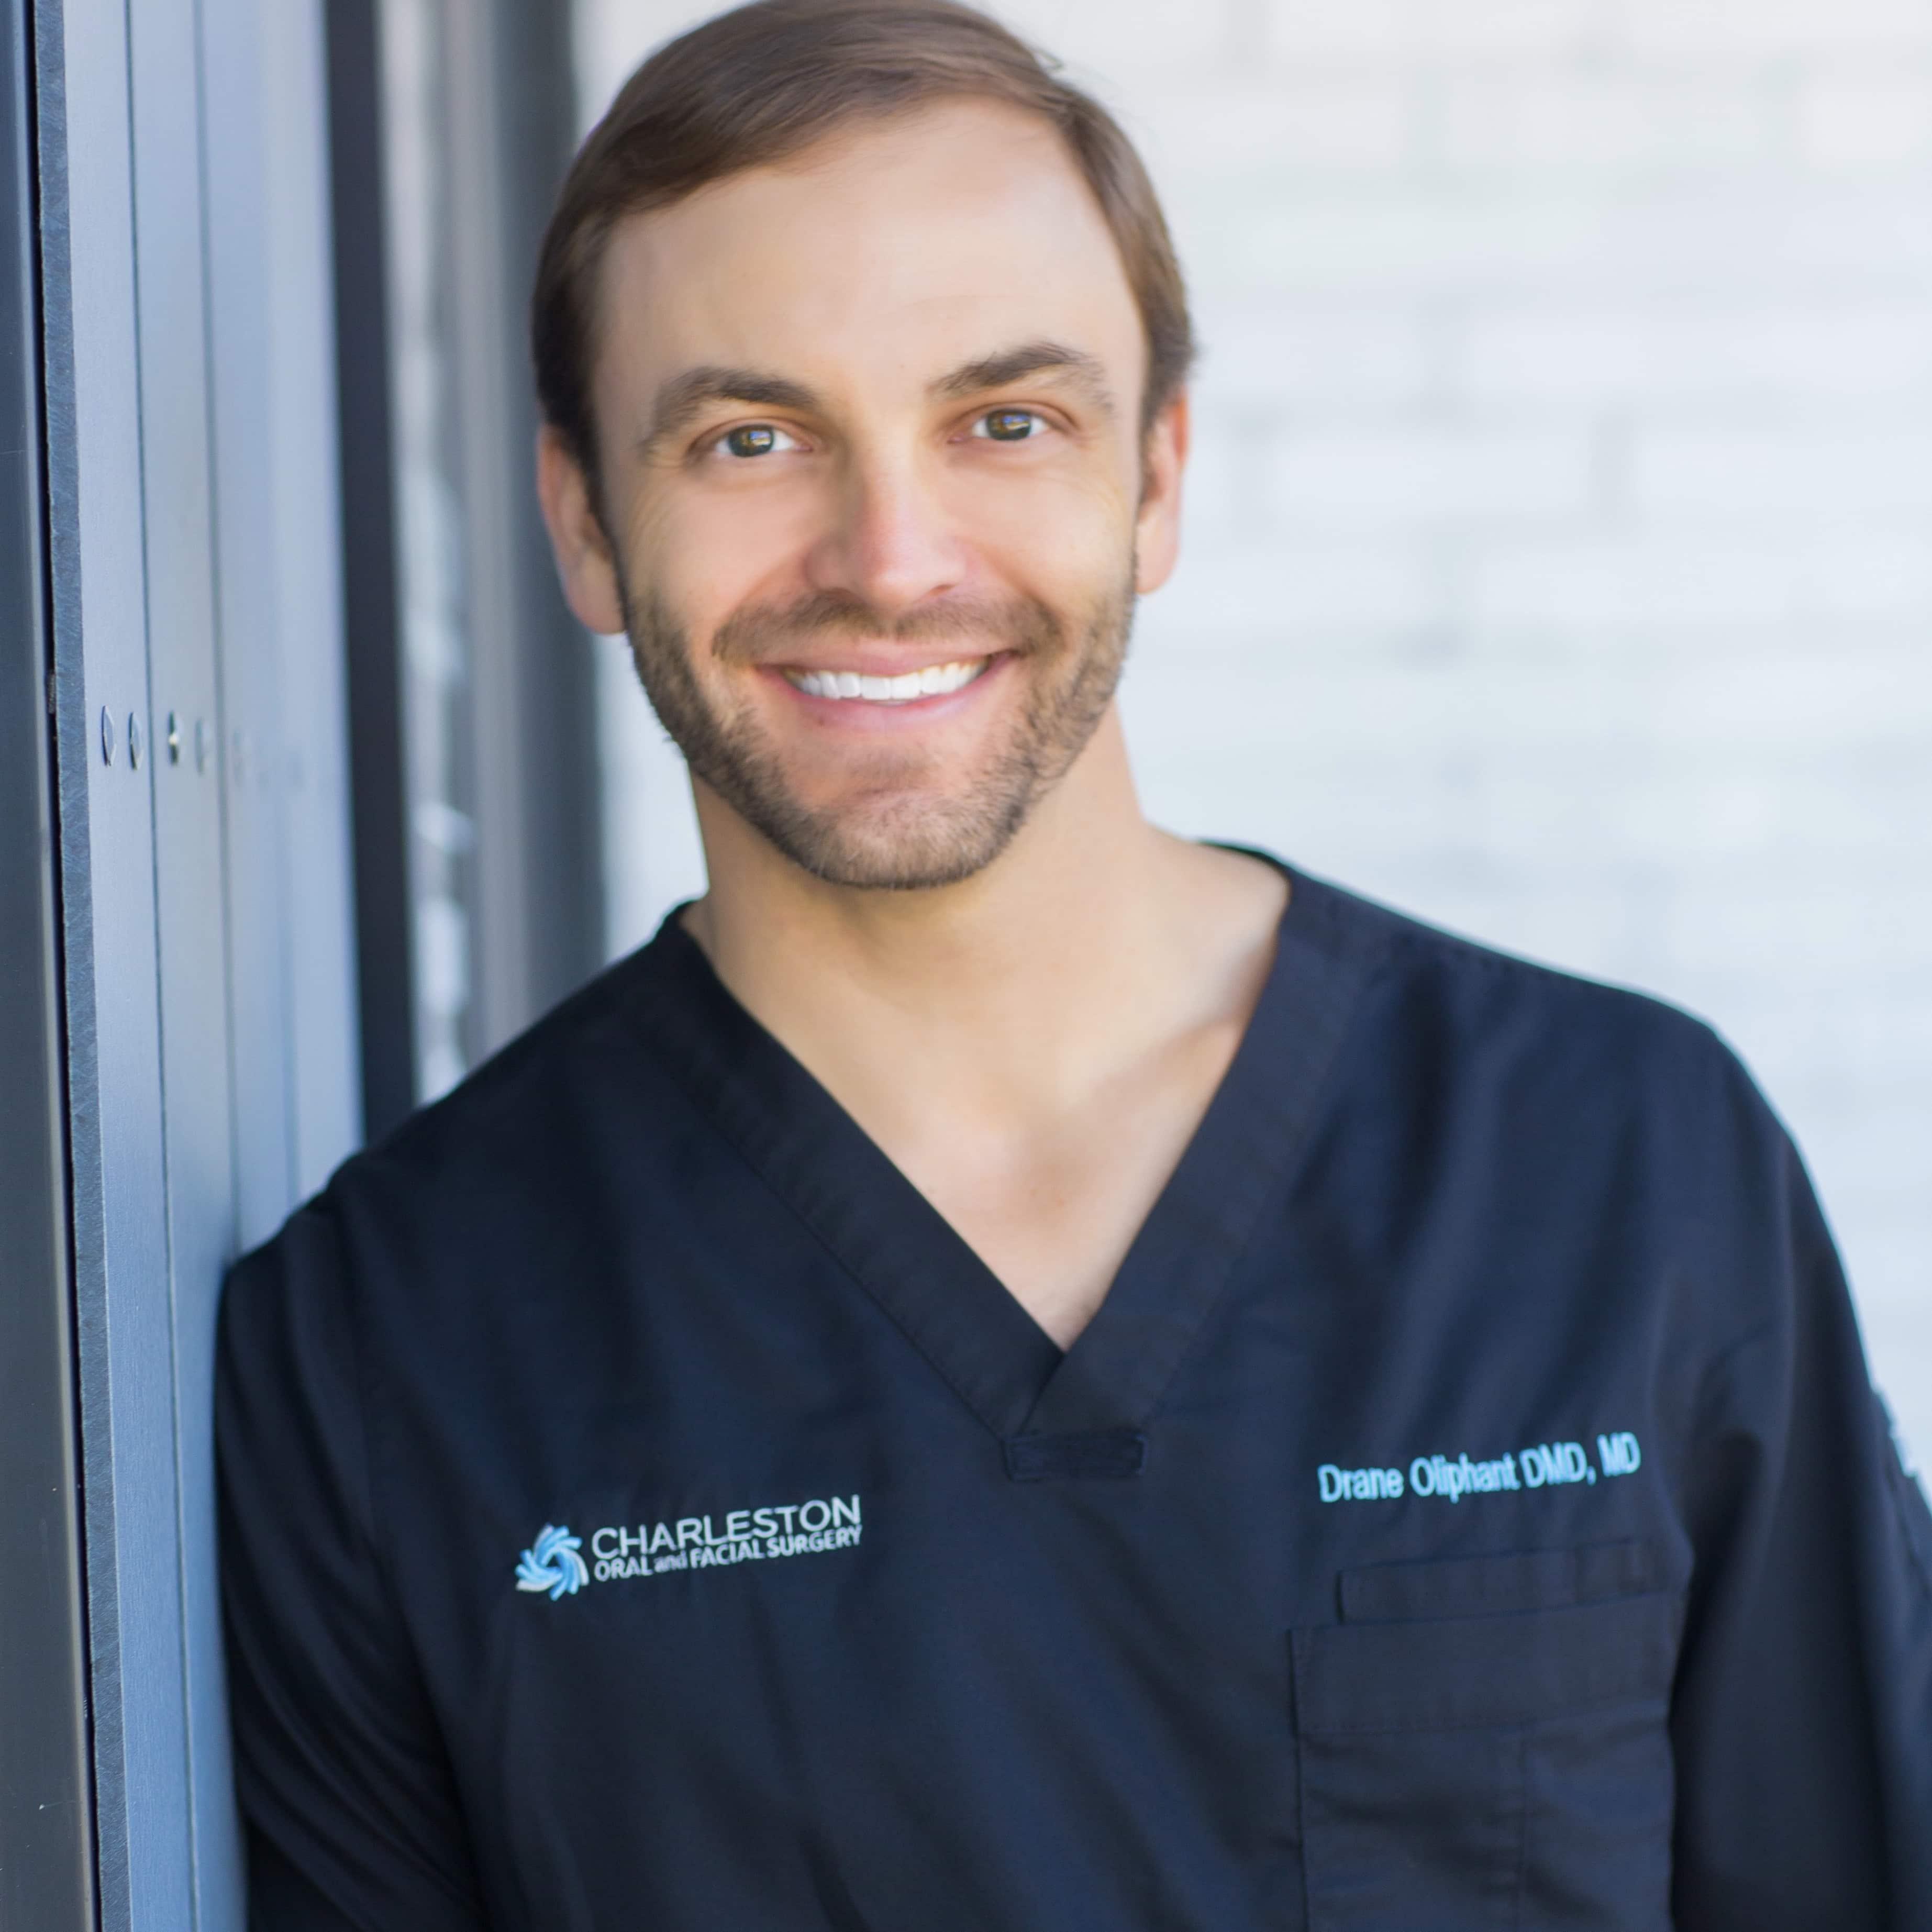 DR. A DRANE OLIPHANT DMD, MD